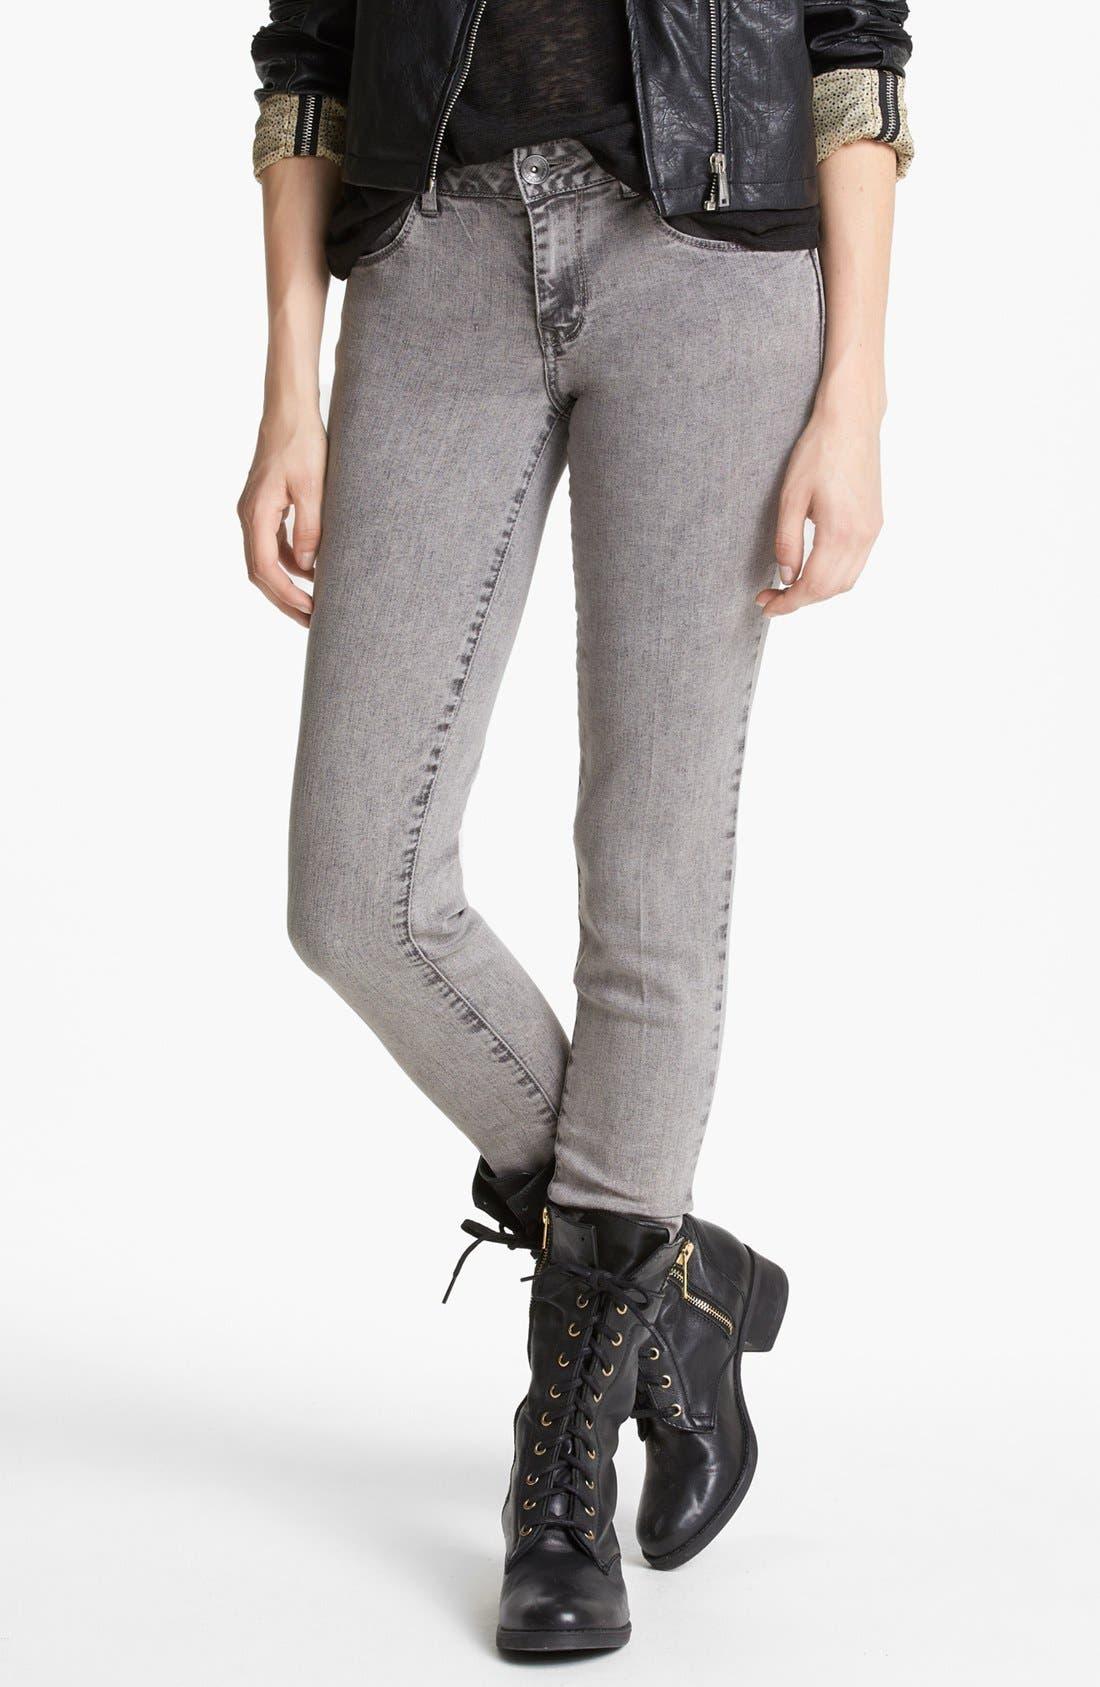 Main Image - Jolt Acid Wash Skinny Jeans (Grey) (Juniors)